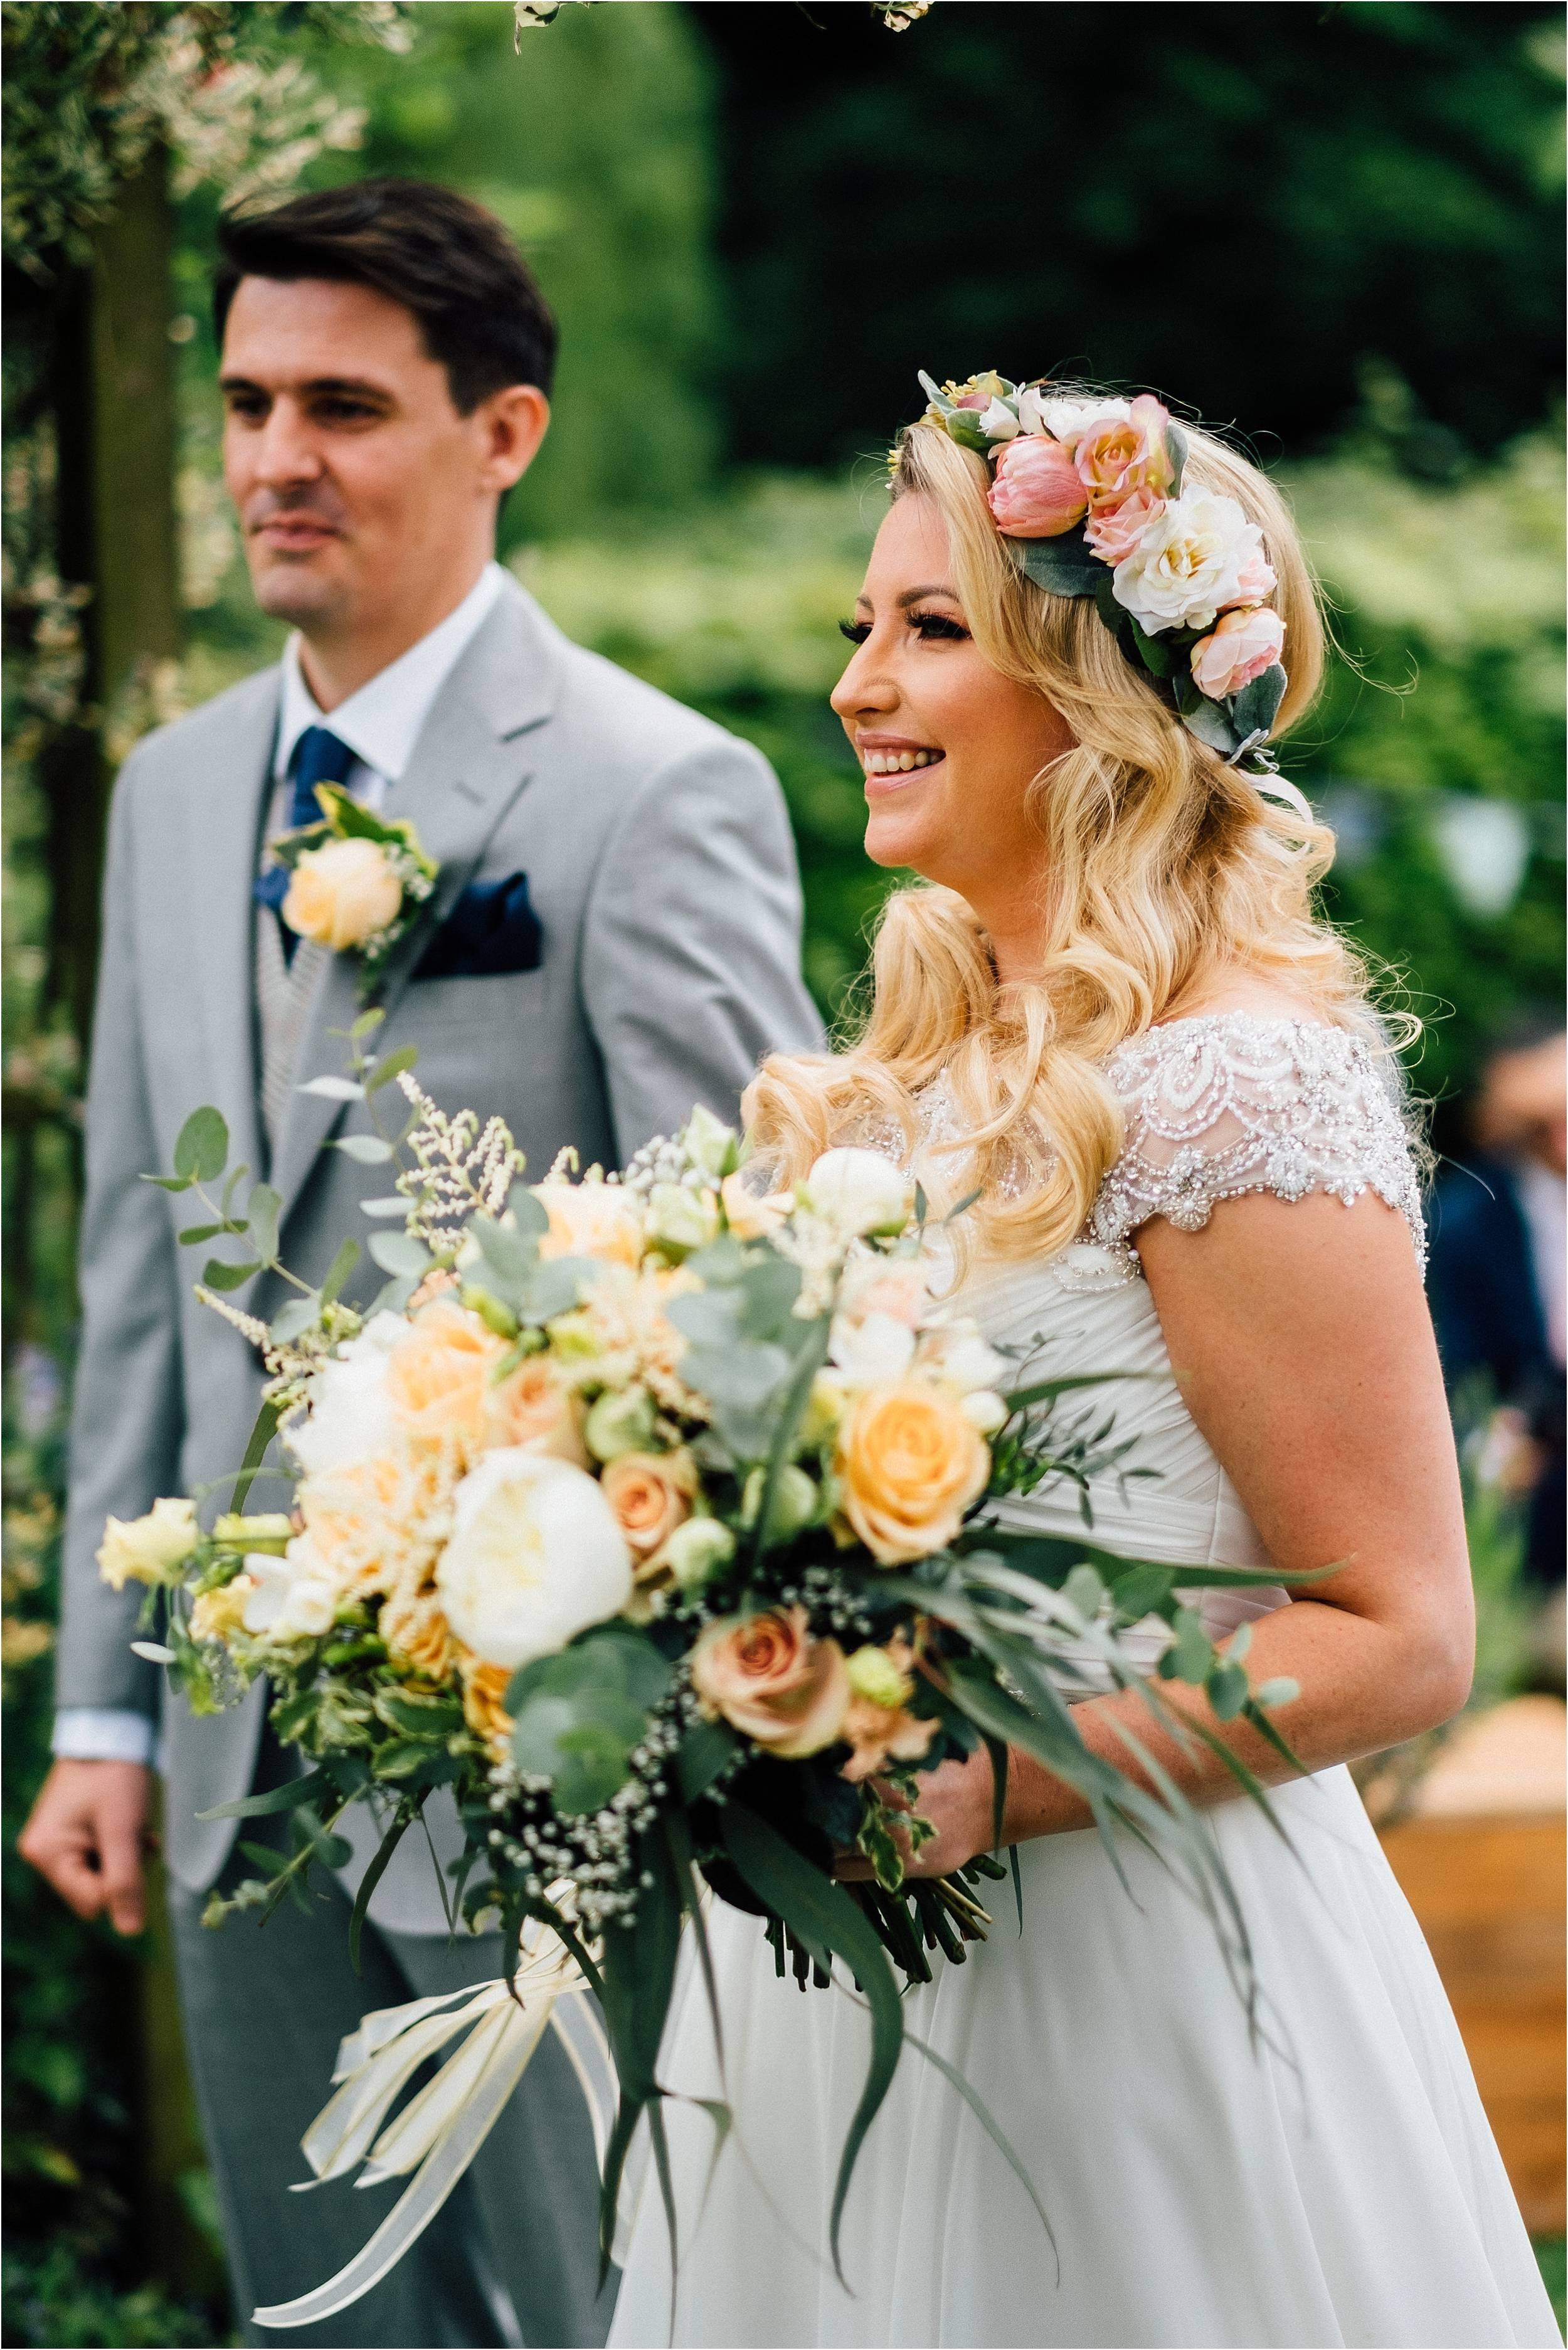 Surrey Hookhouse Farm Wedding Photographer_0051.jpg